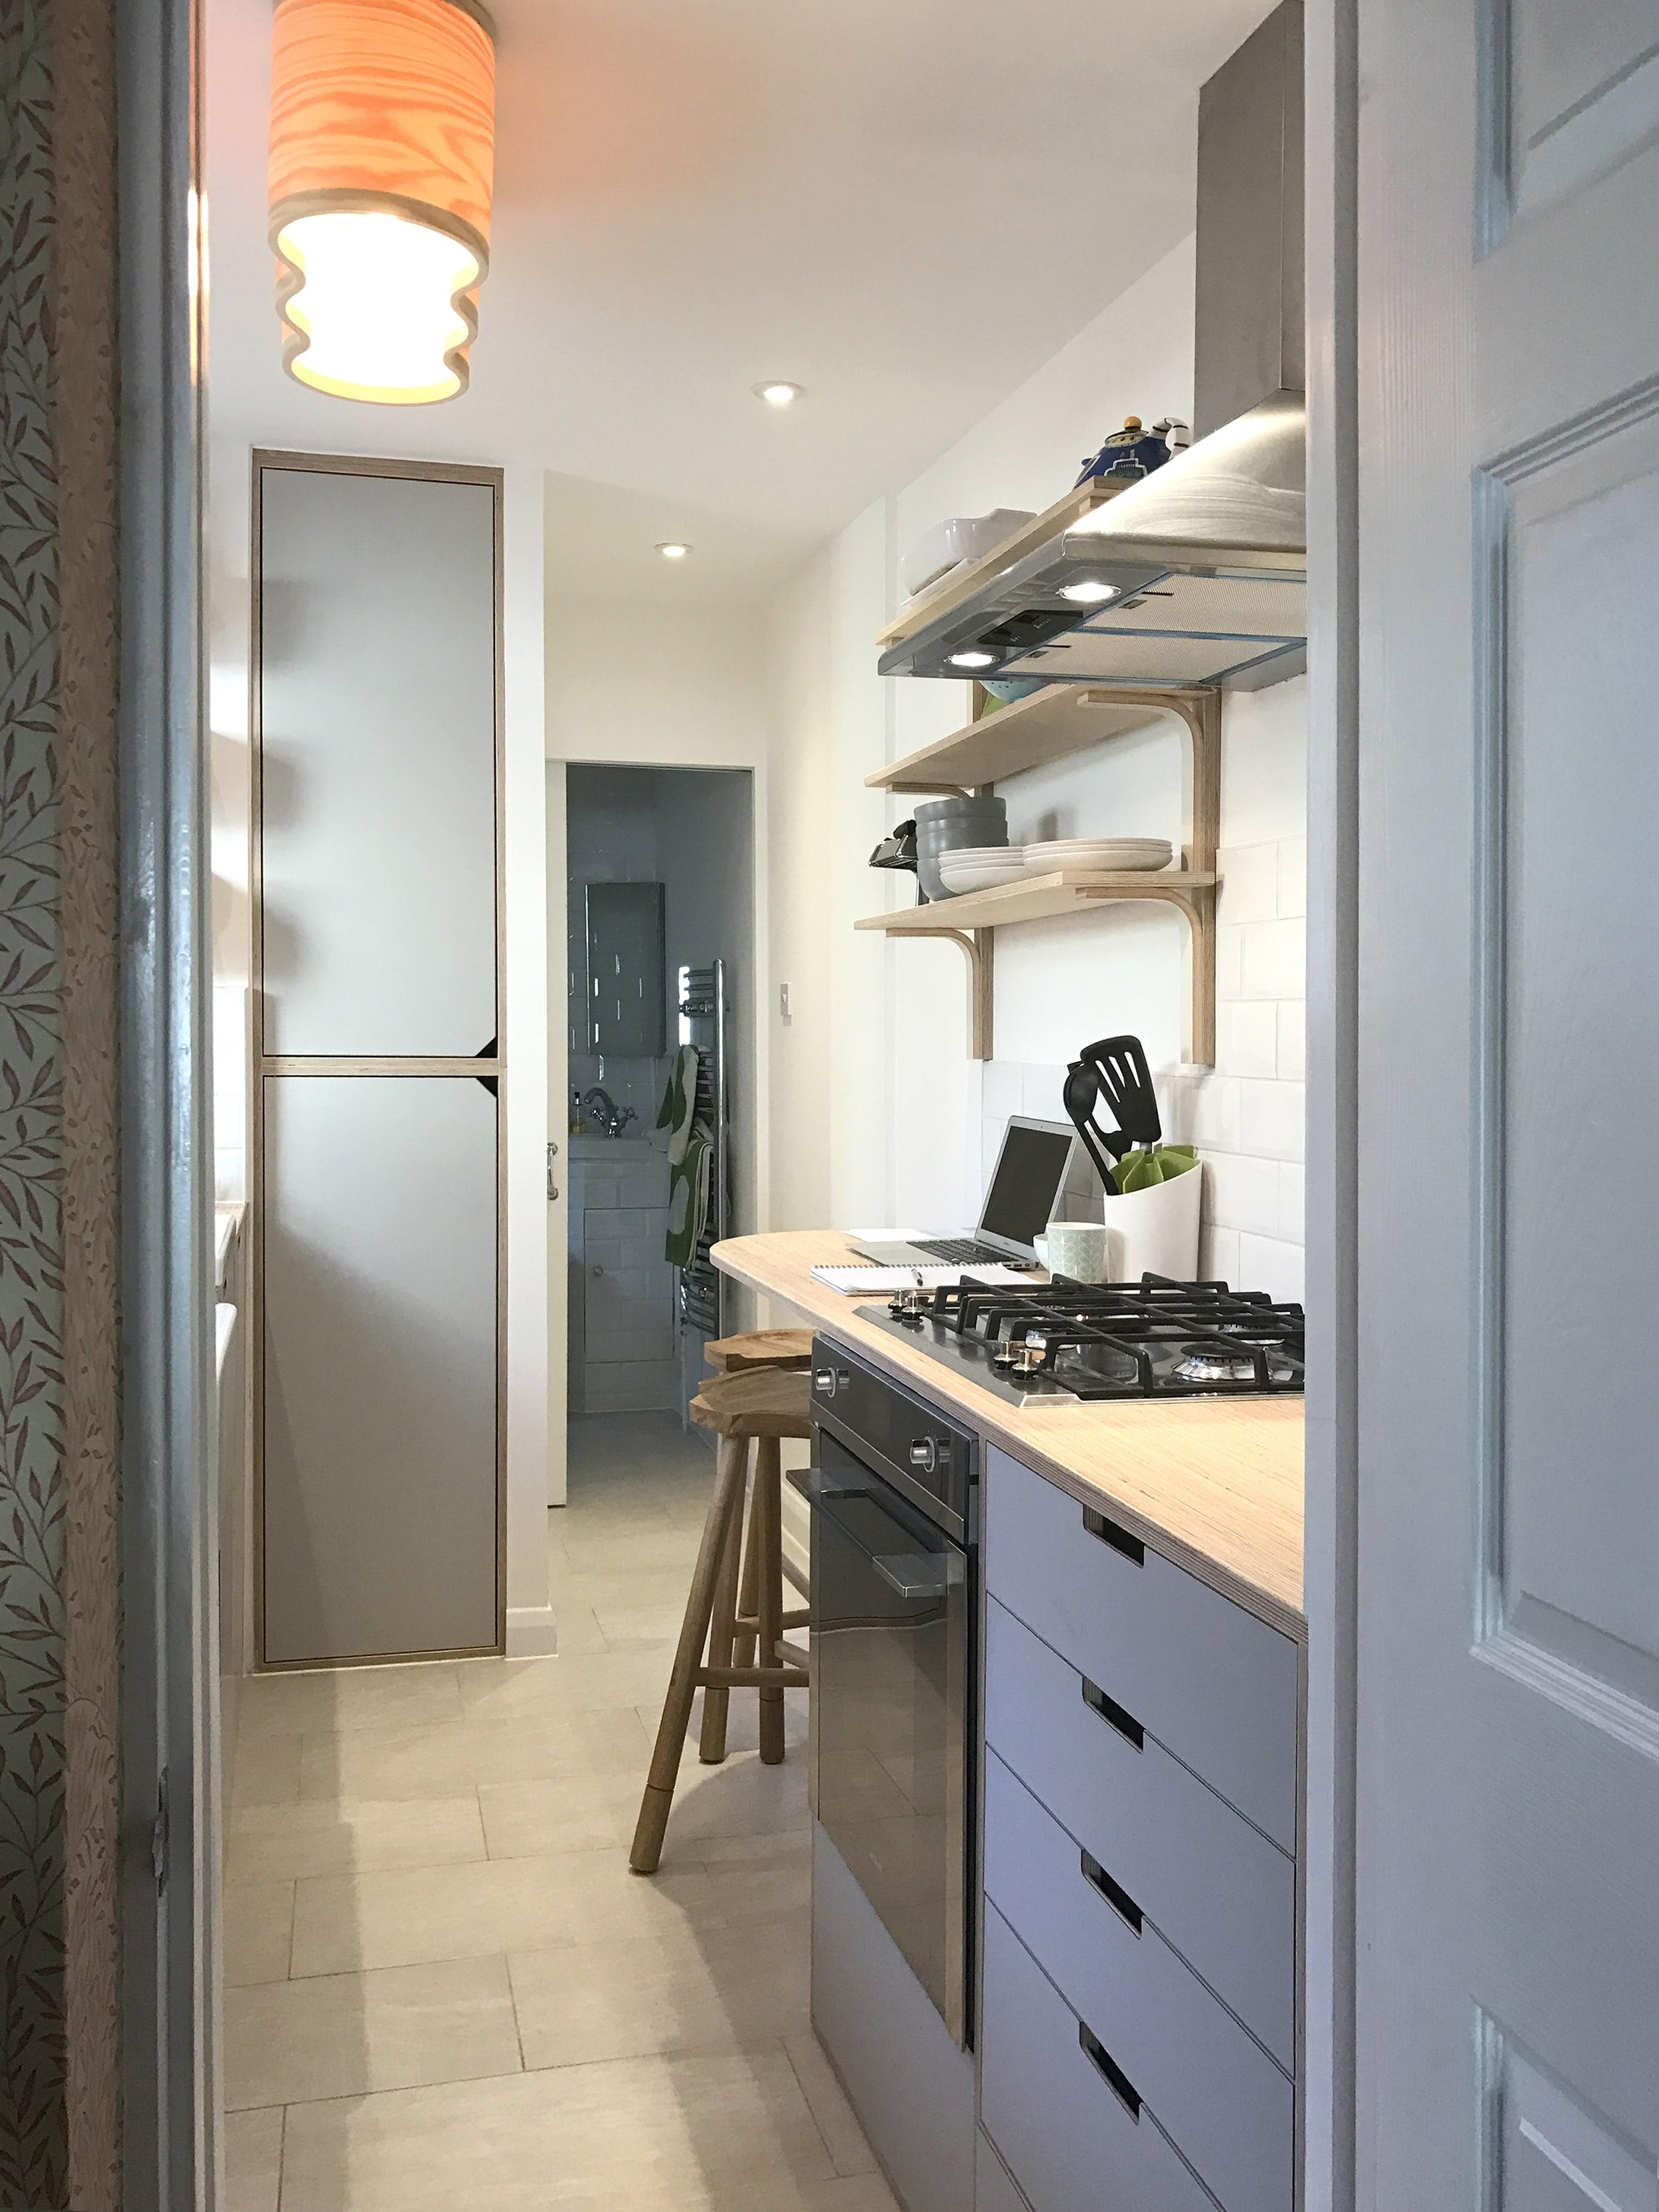 Georgina's plywood kitchen in Richmond, designed by Lozi